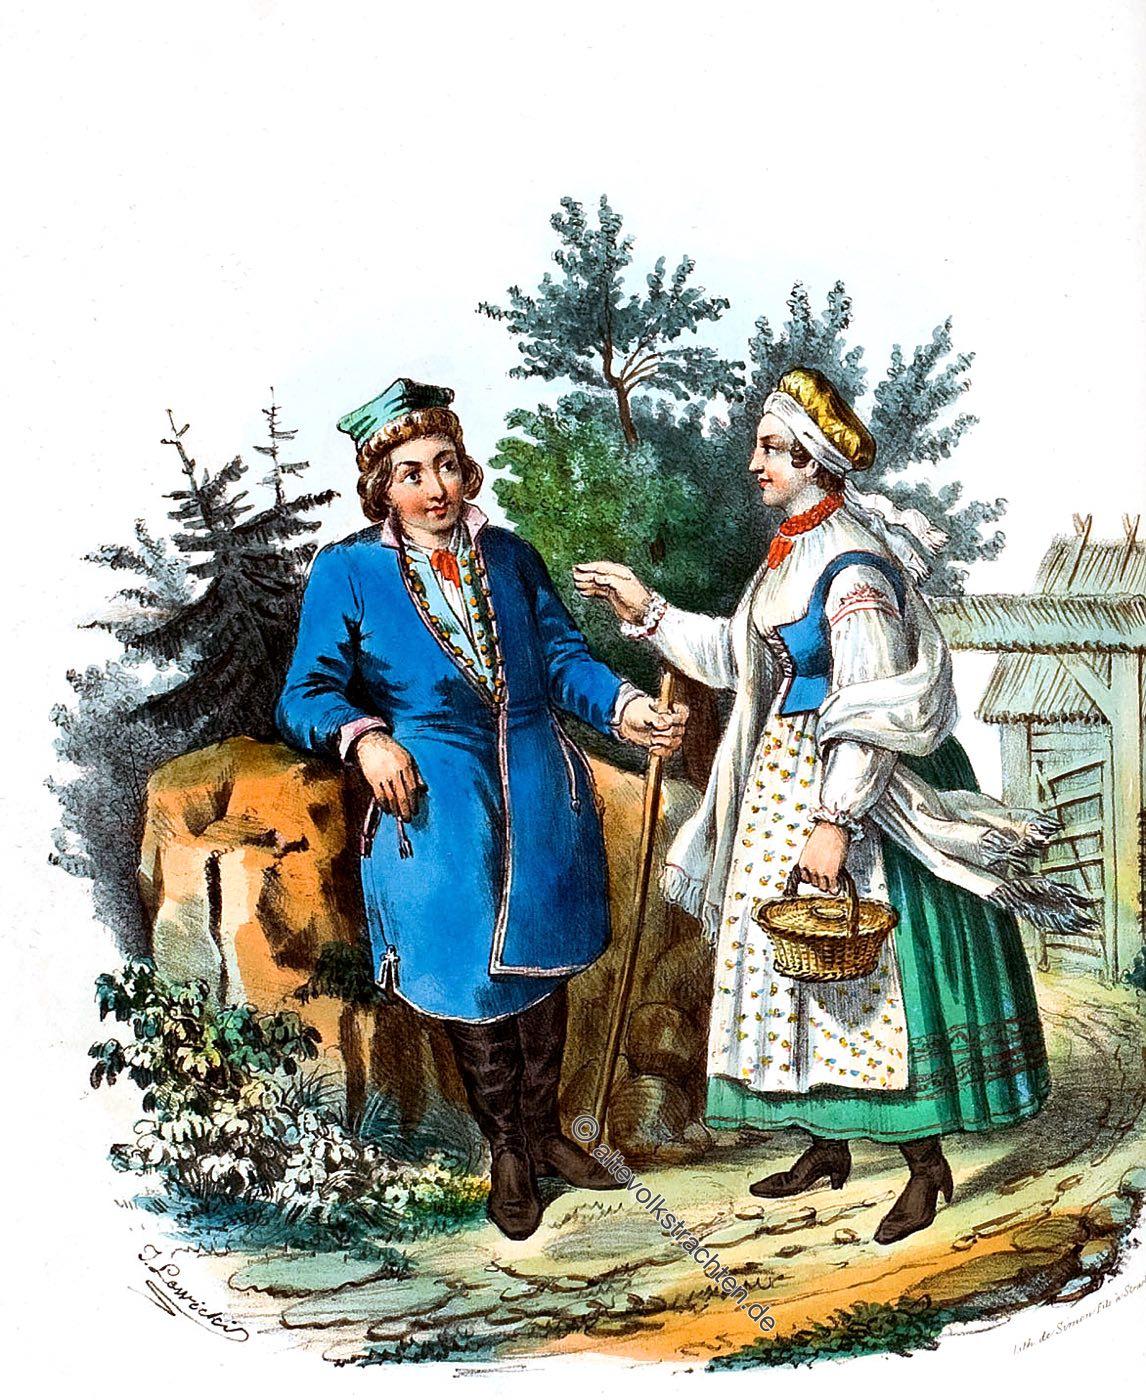 Skawina, SKAWINIACY, Trachten, Polen, Landleute, Bauerntrachten